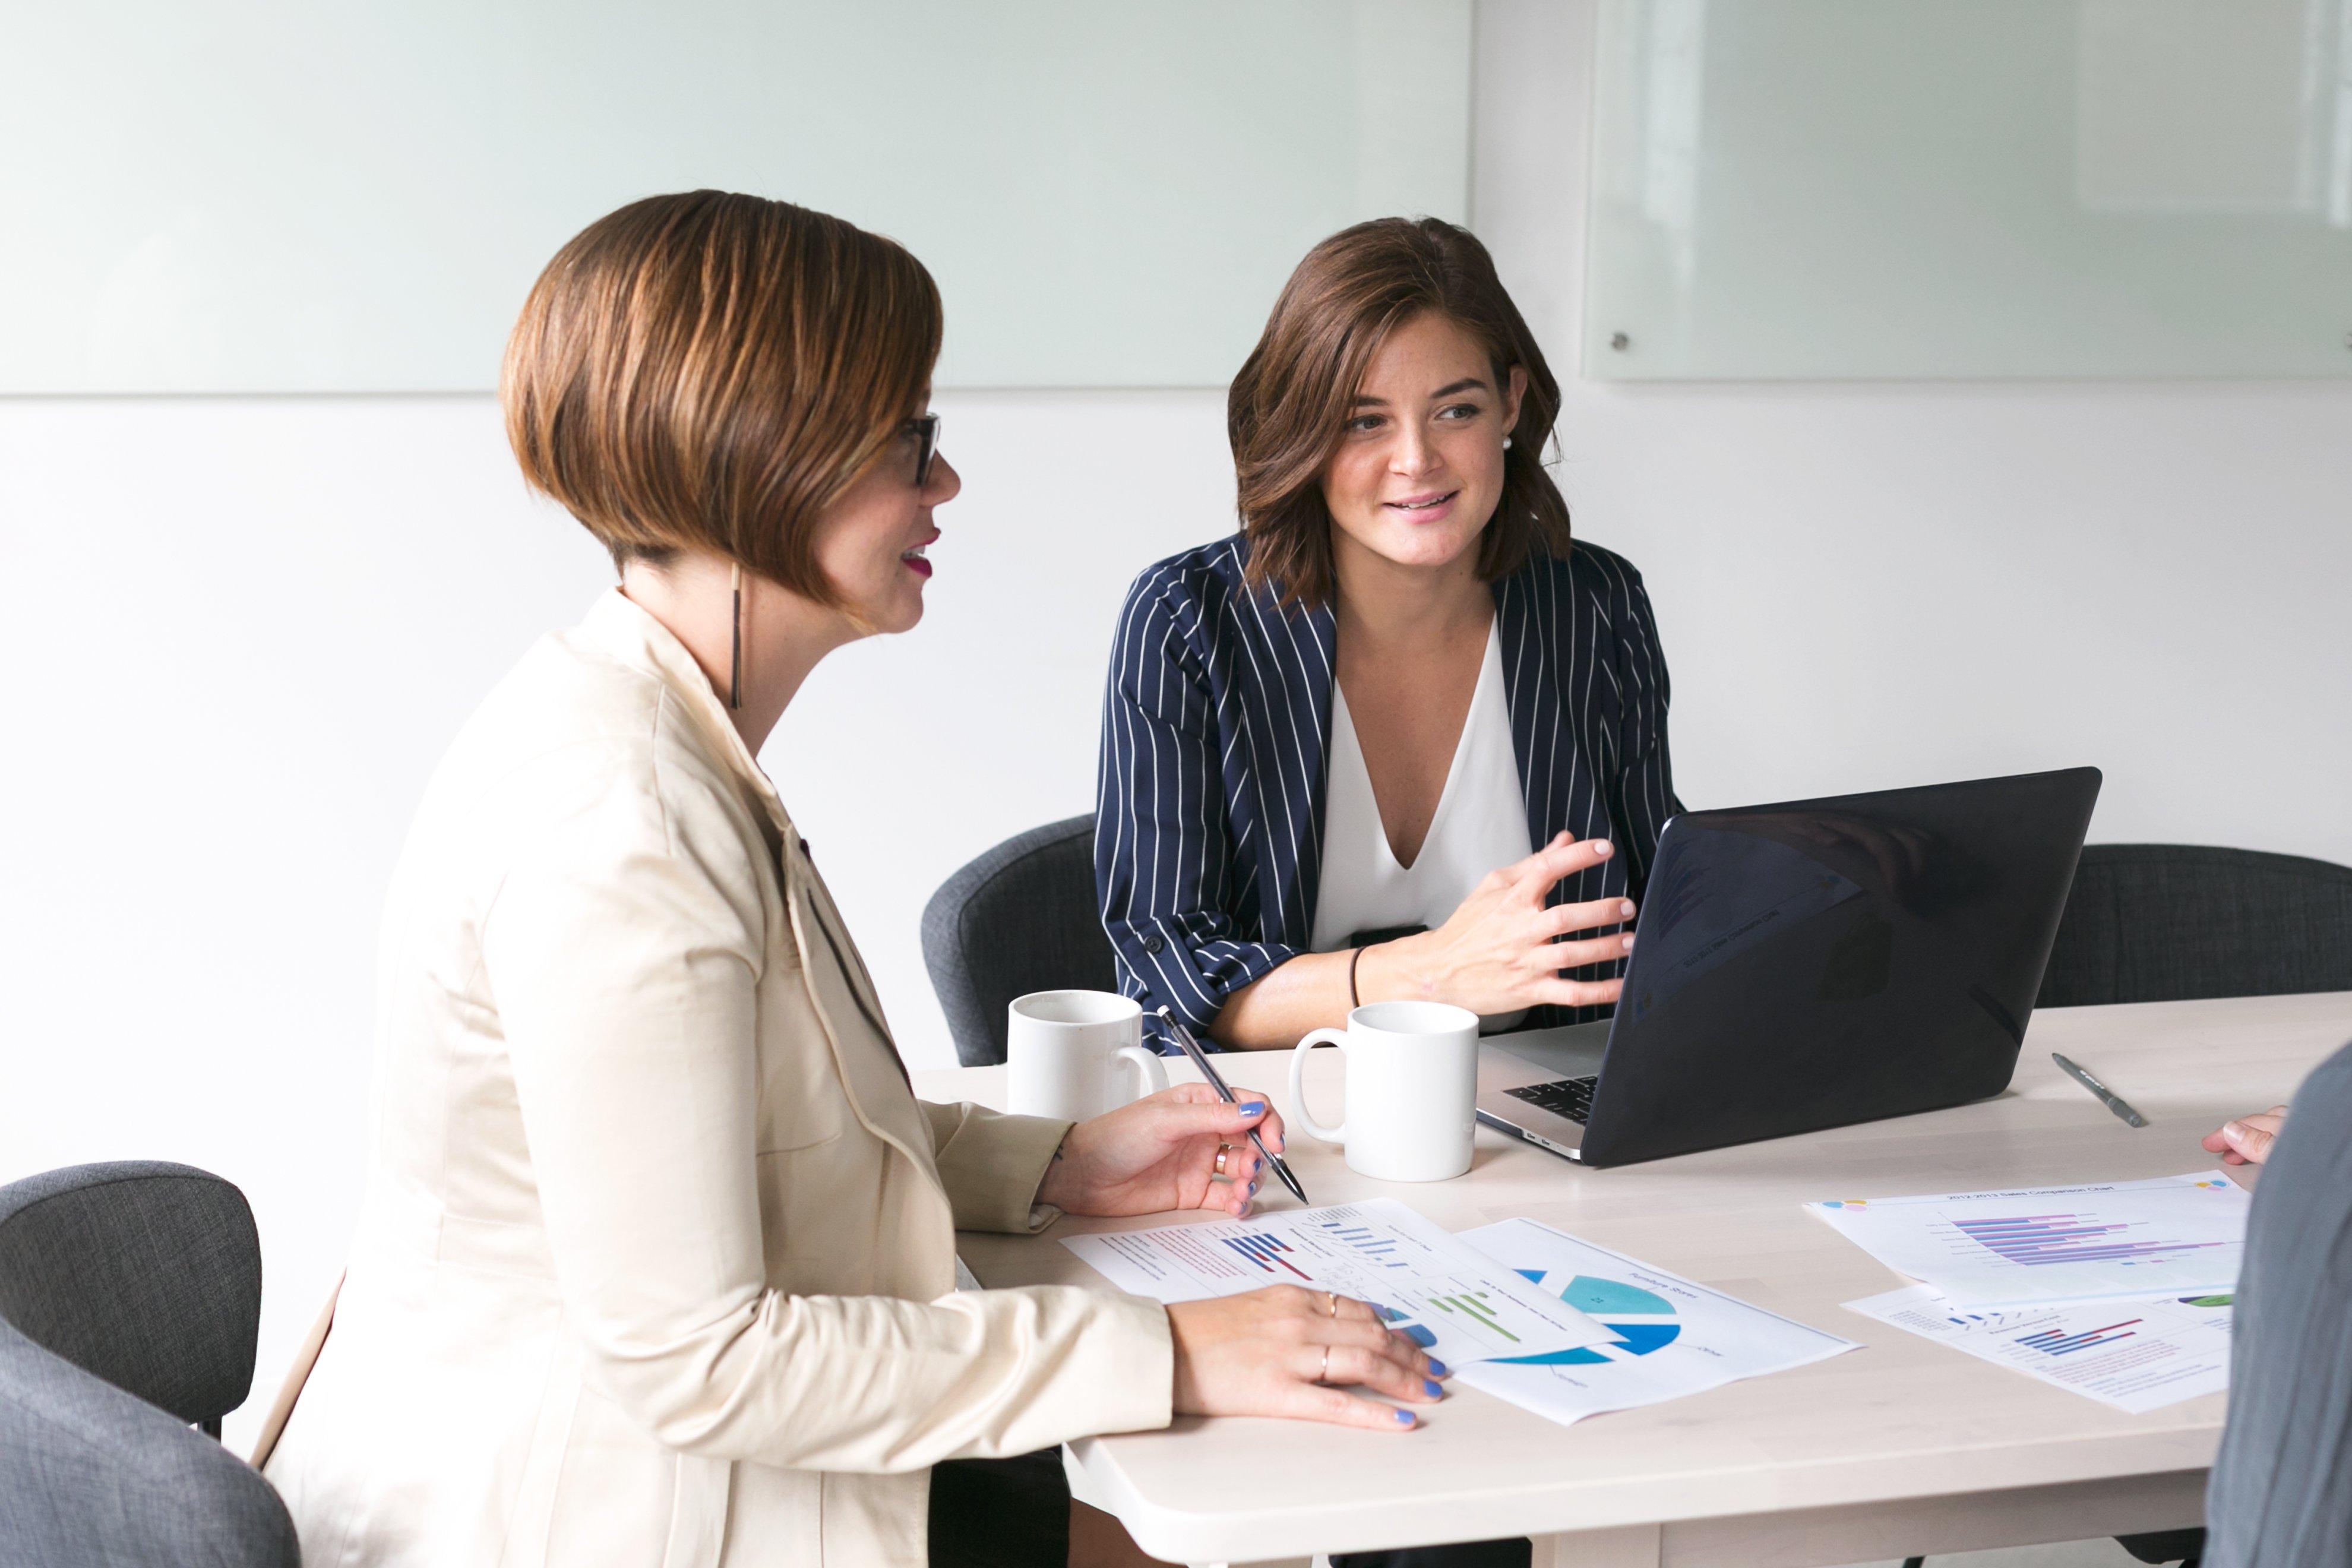 8 Communication Skills Every Manager Needs